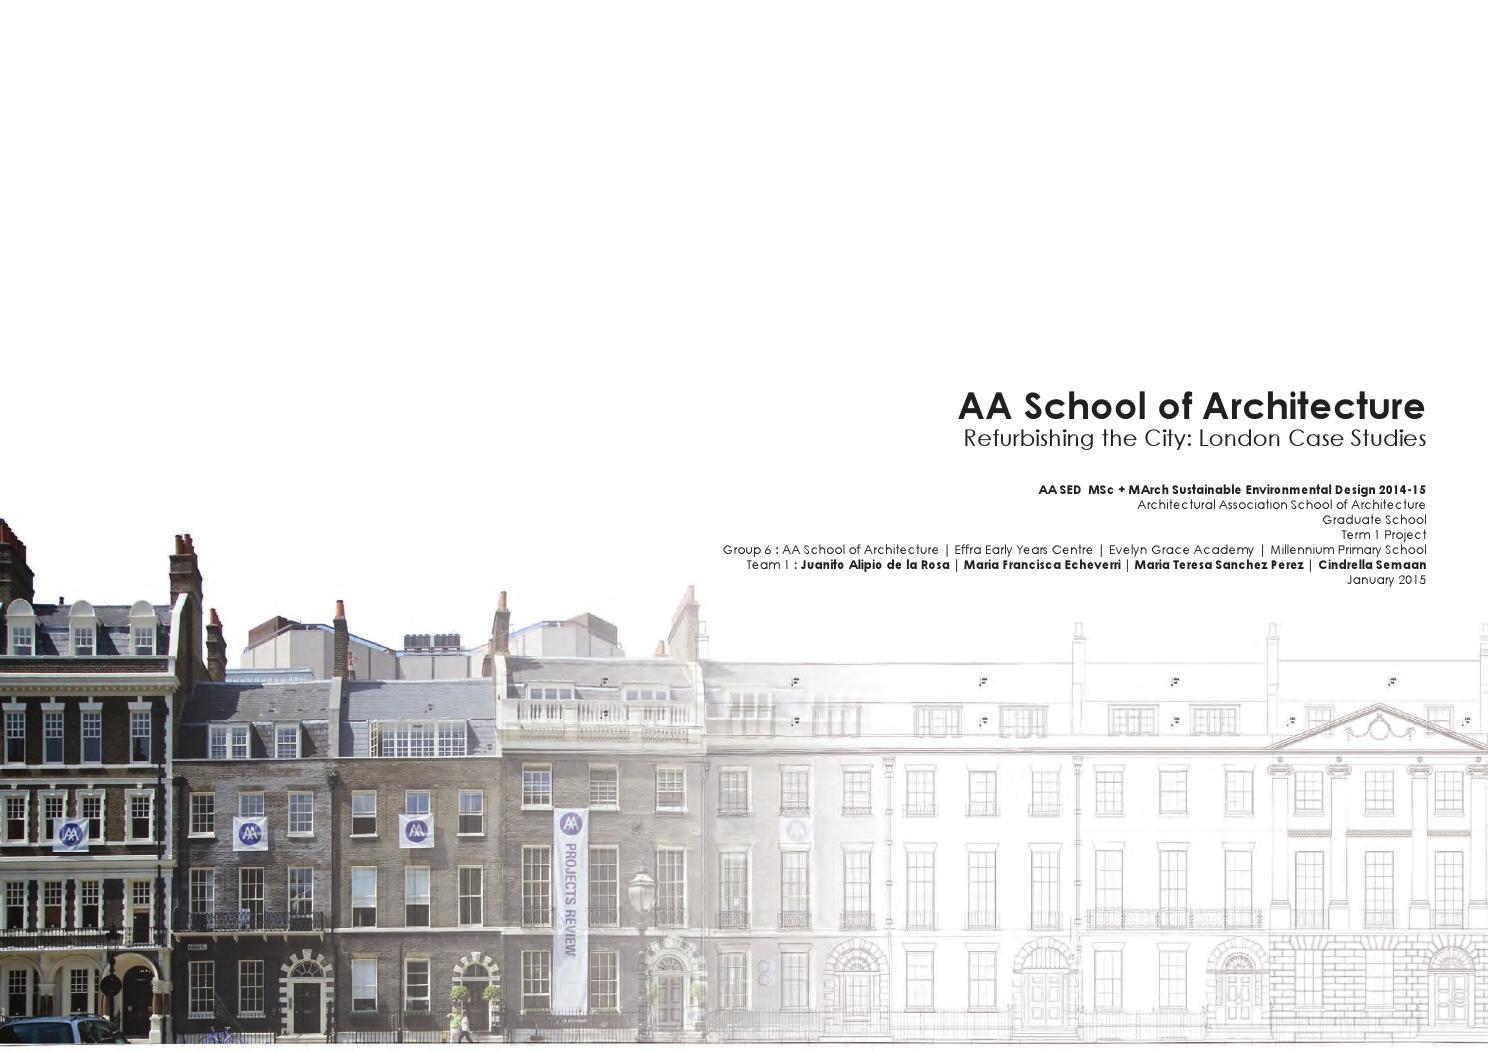 Primary school architecture case study